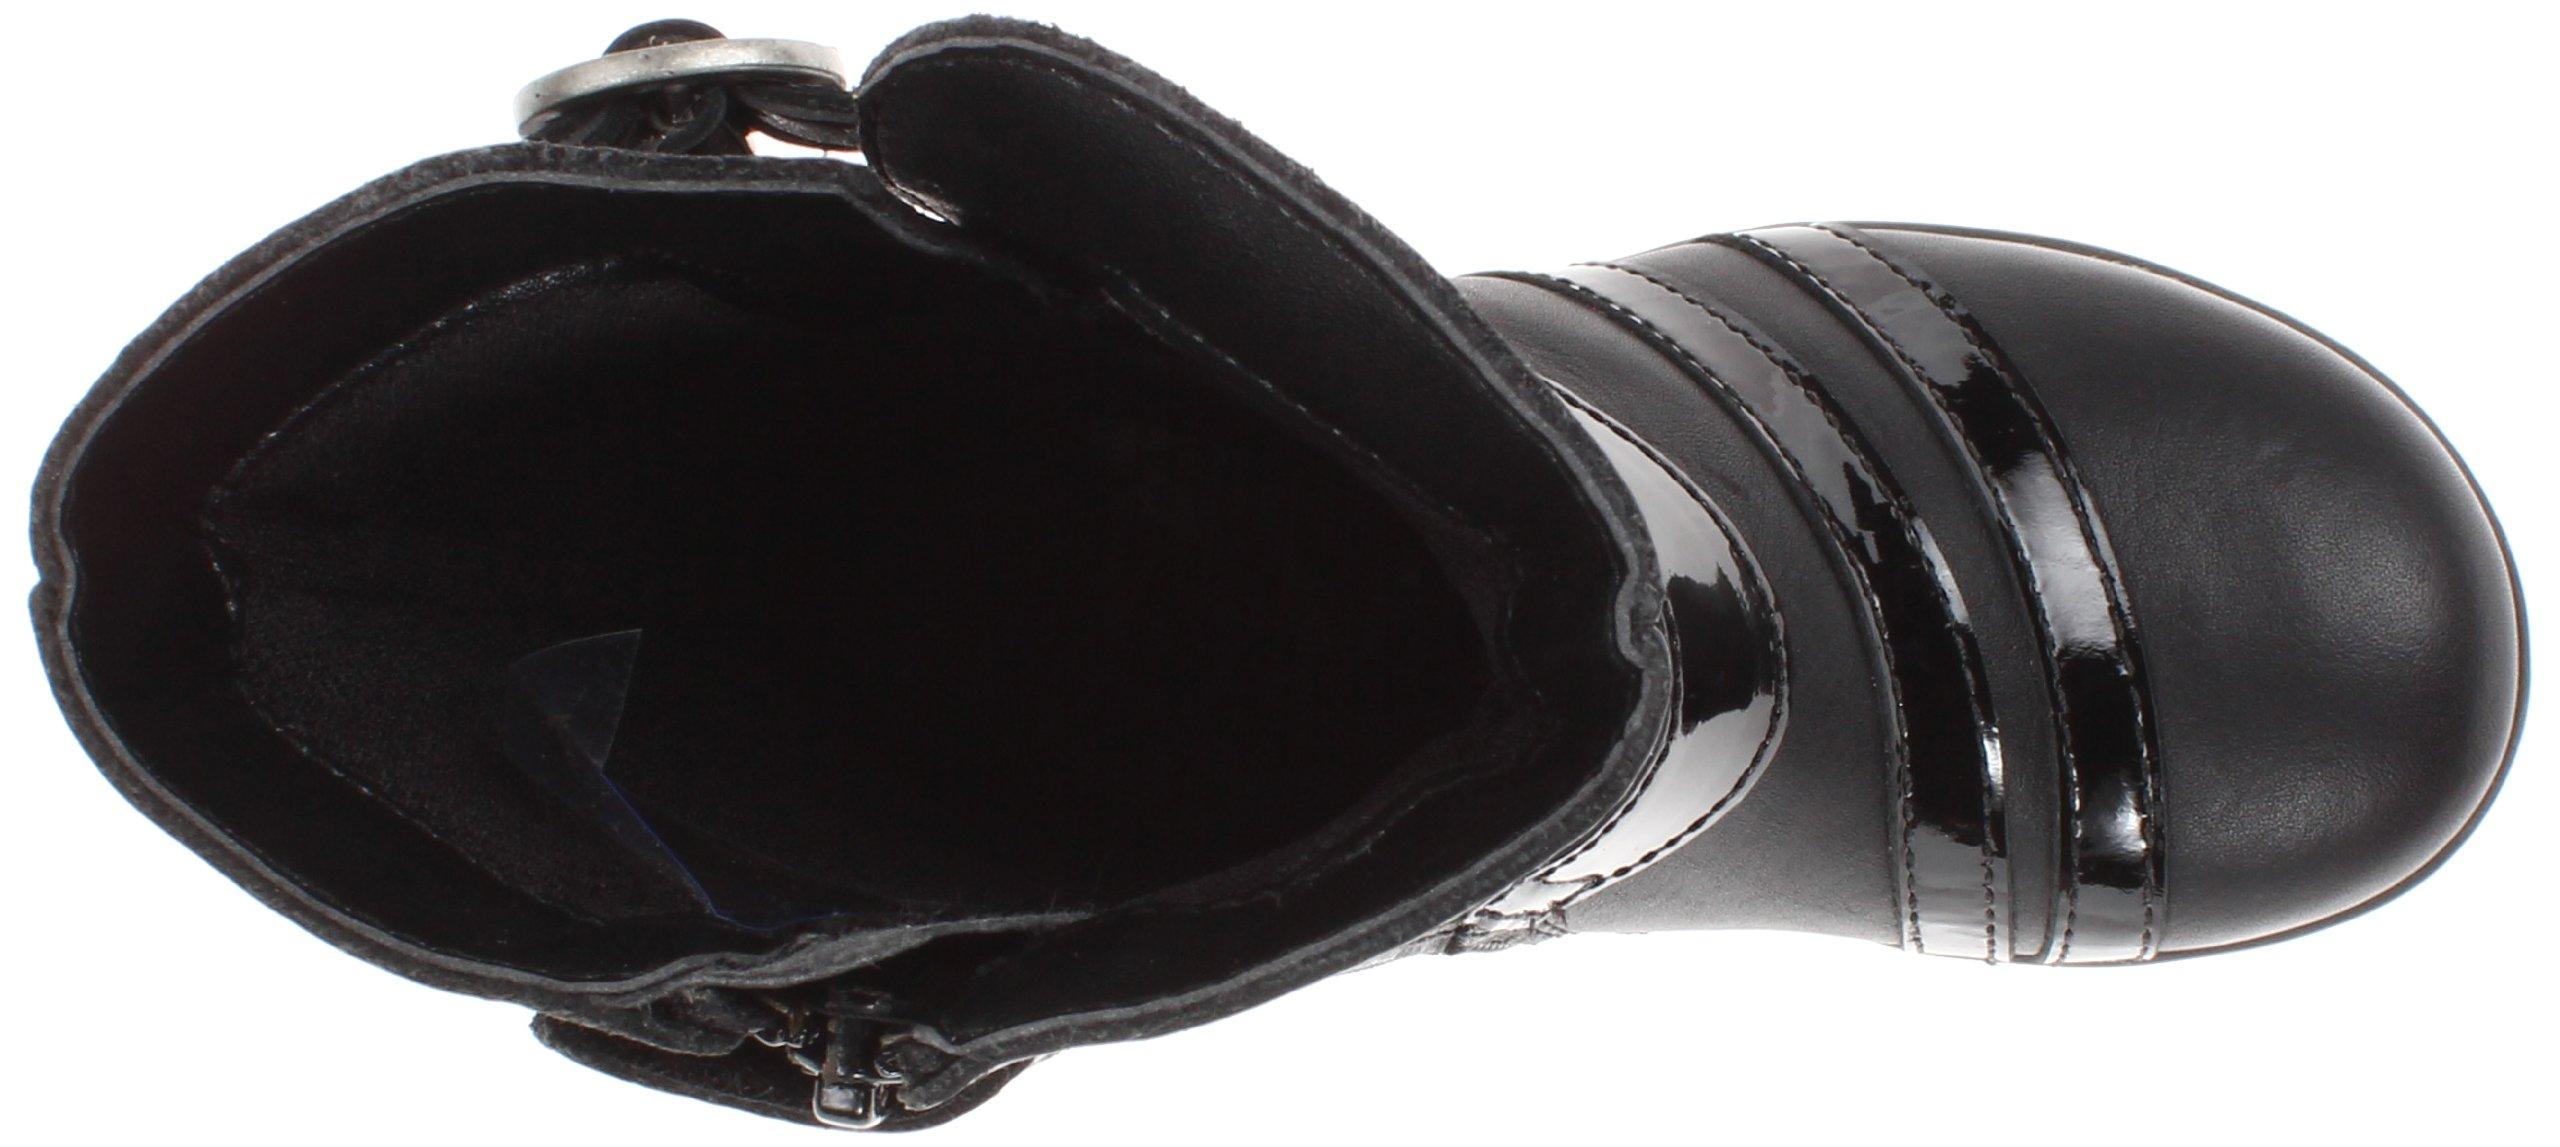 Kickers Kid's Angelyn Boot, Black, 28 (US 10.5 Little Kid) M US by Kickers (Image #7)